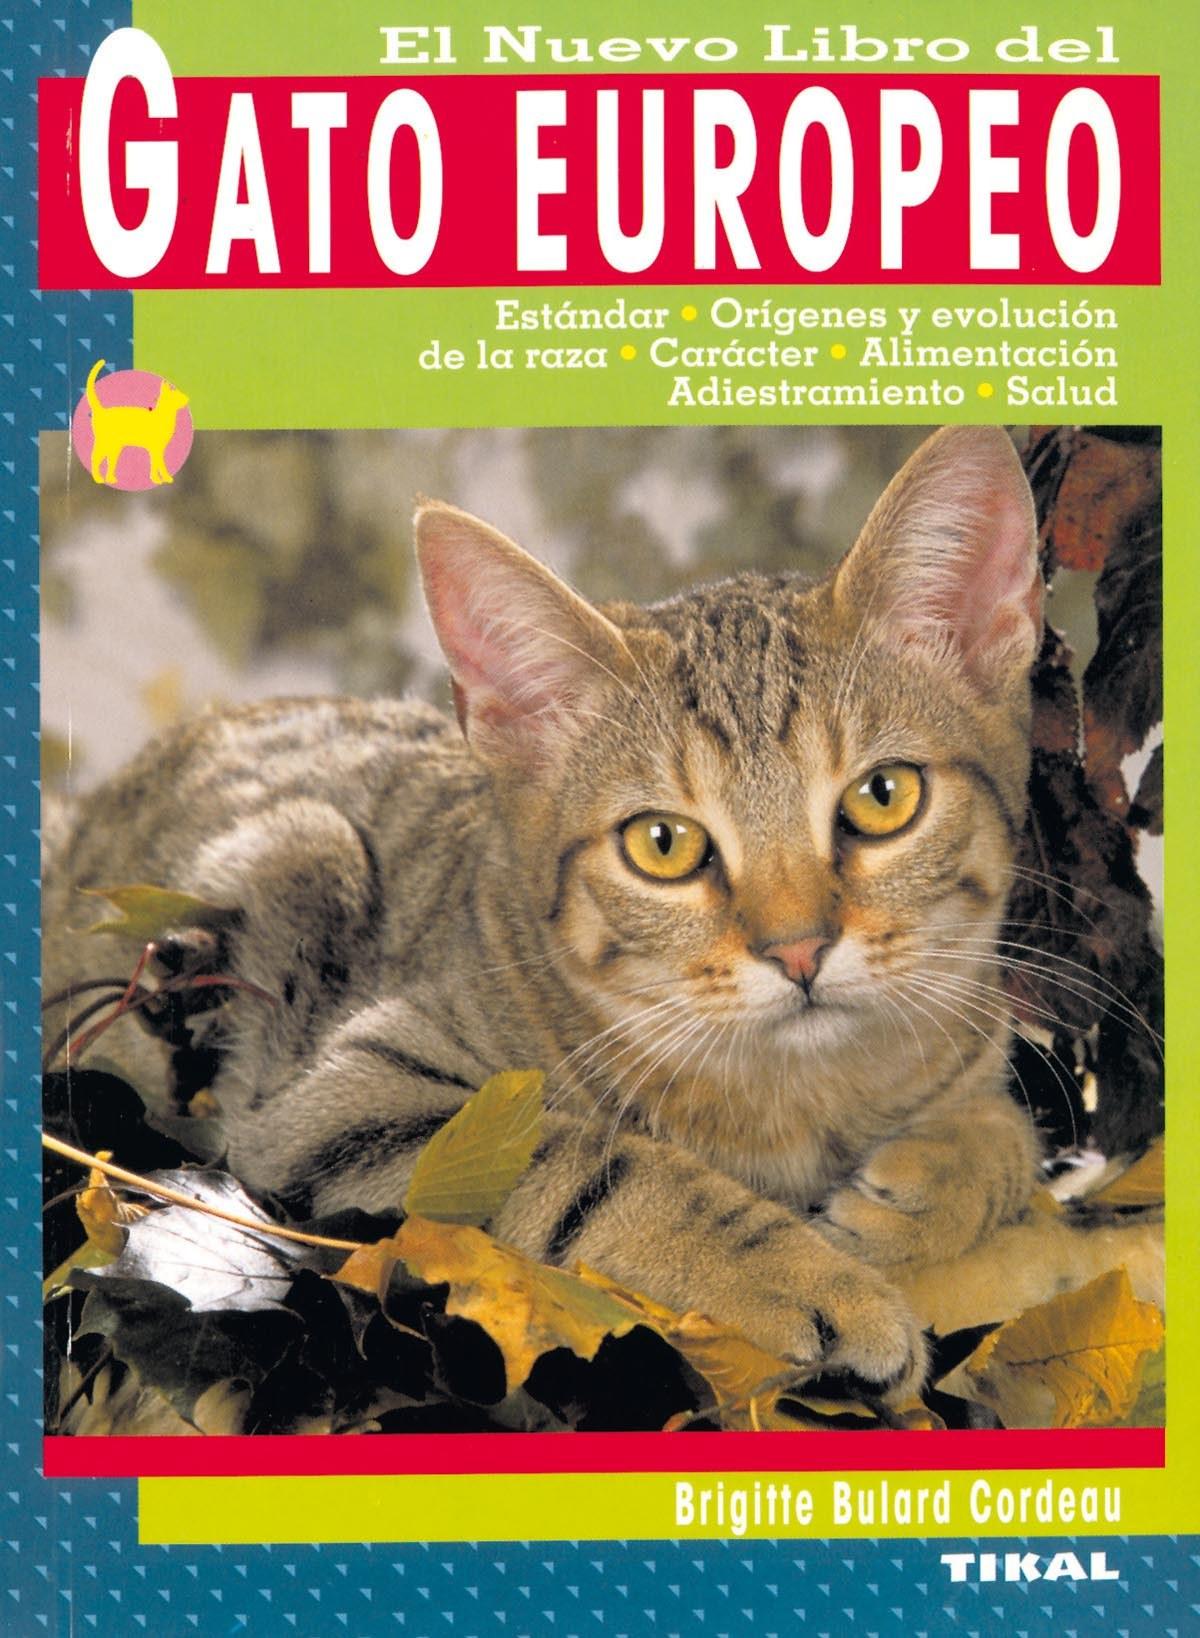 Gato europeo 9788430548224